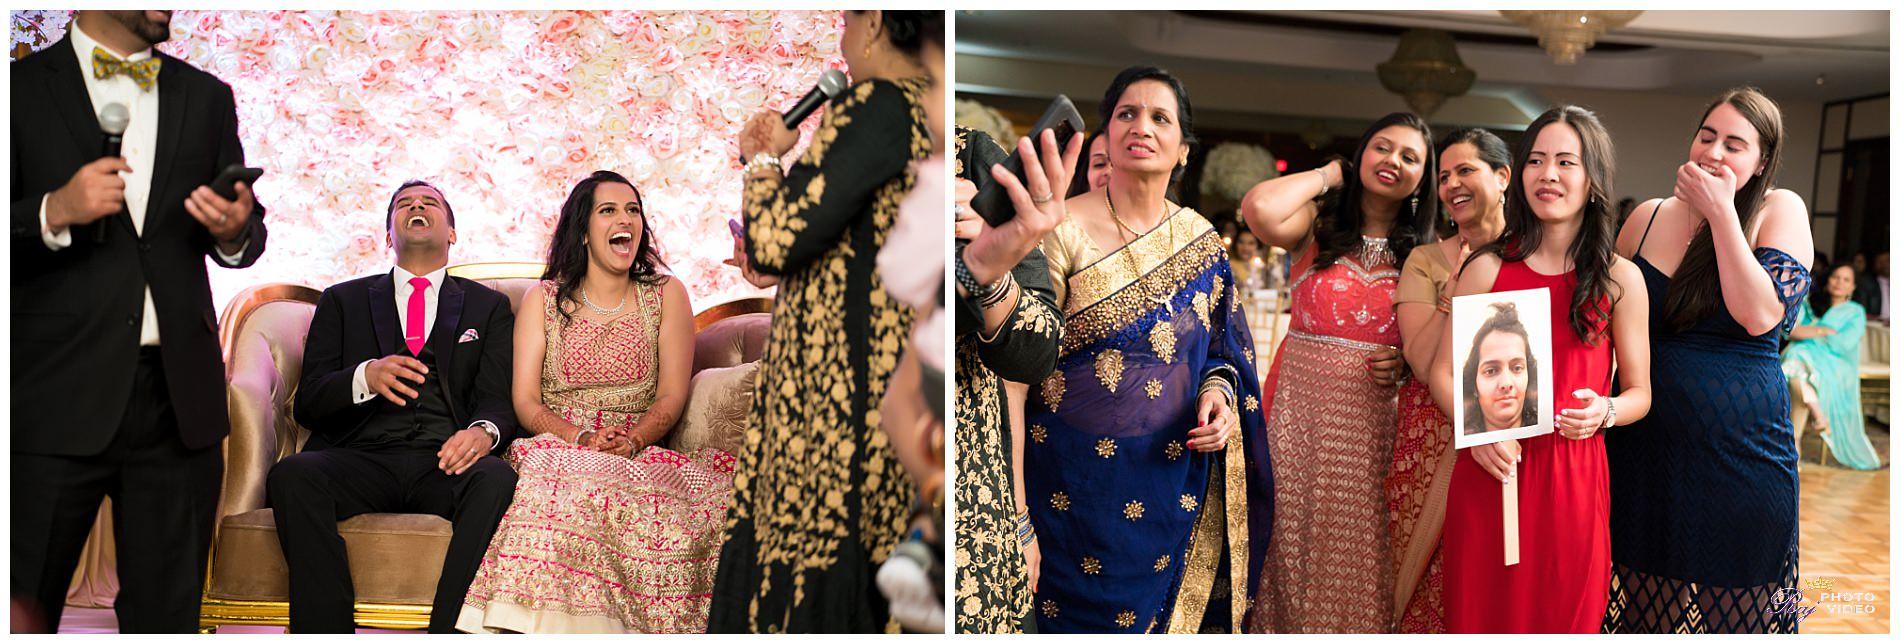 Martinsville-Gardens-NJ-Indian-Wedding-Ruchi-Vishal-64.jpg